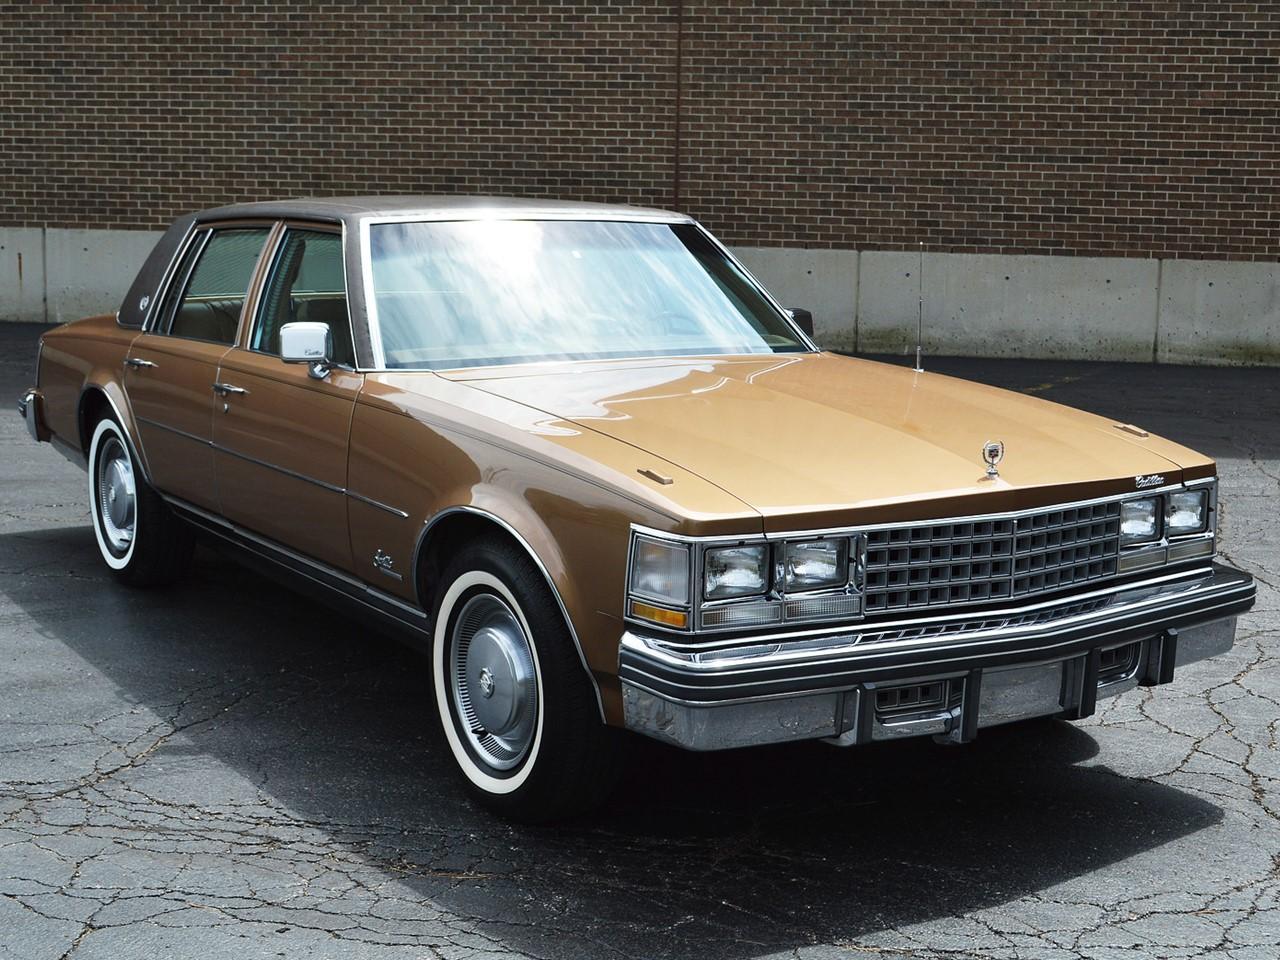 1976 Cadillac Seville 13